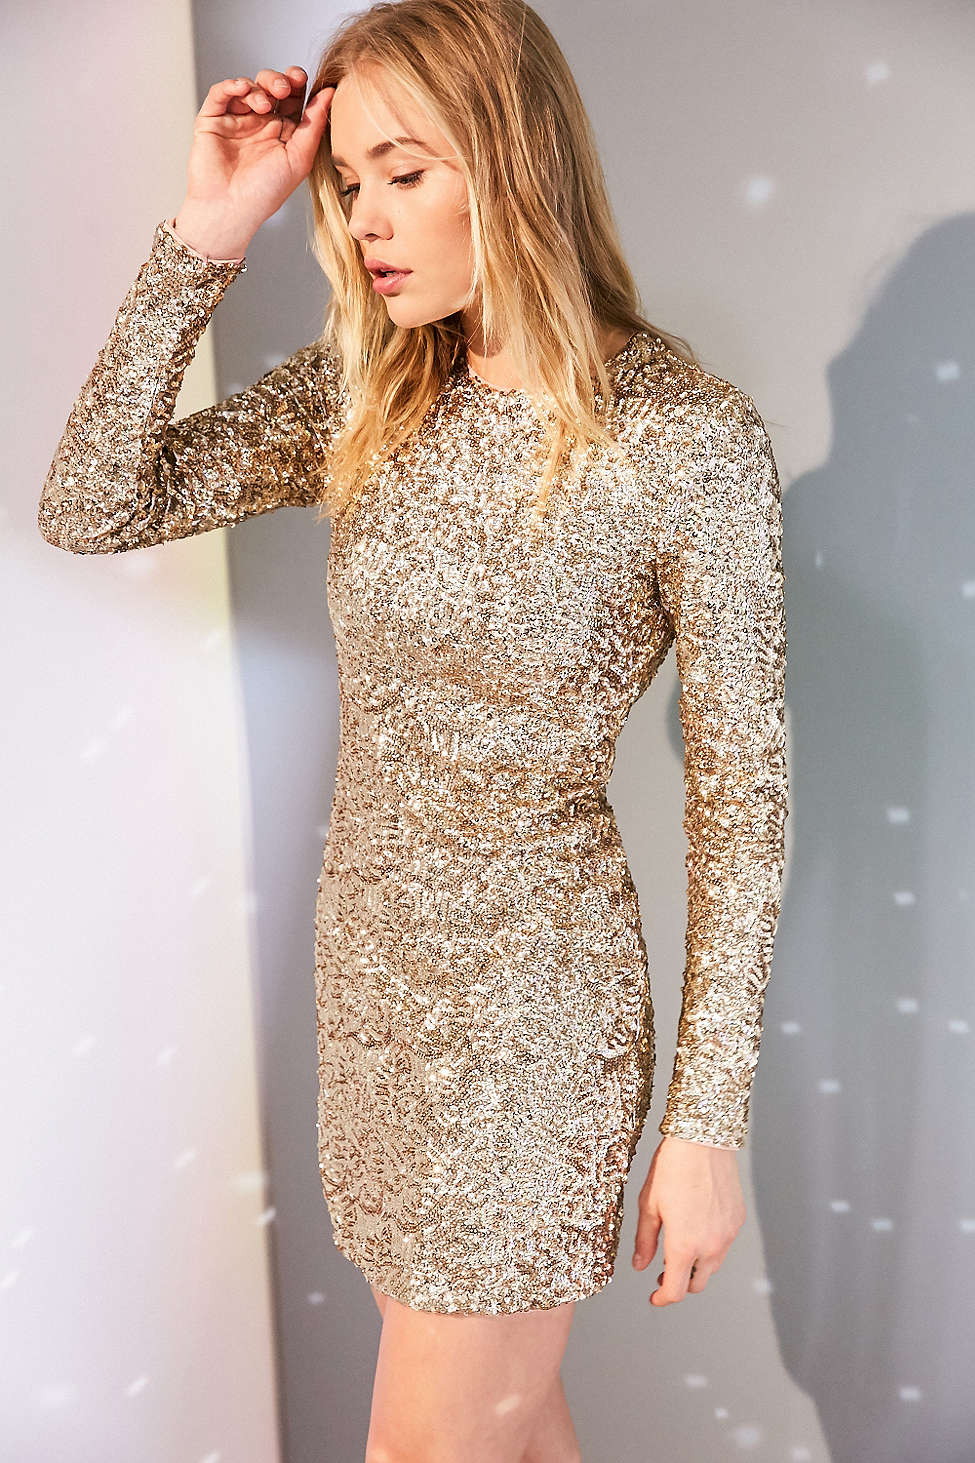 Kimchi Blue Firestarter Long-Sleeve Sequin Mini Dress - Unwrap These 10 Holiday Dresses